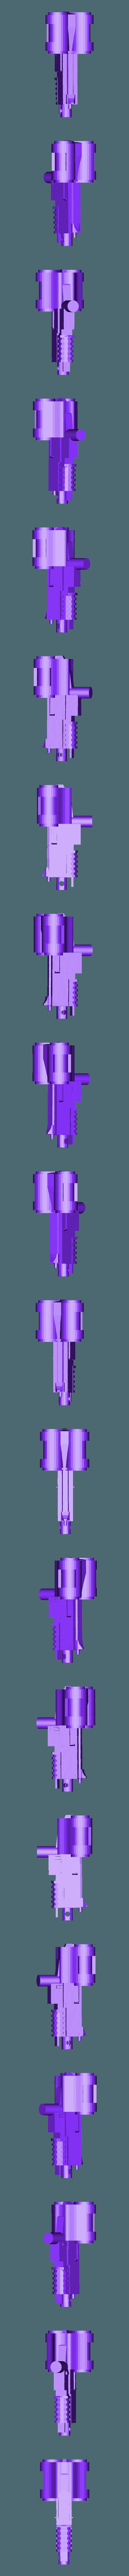 Top_Bolter.stl Download free STL file Cronusine Pattern Terminator Builder • 3D printing template, HappyDuck3D